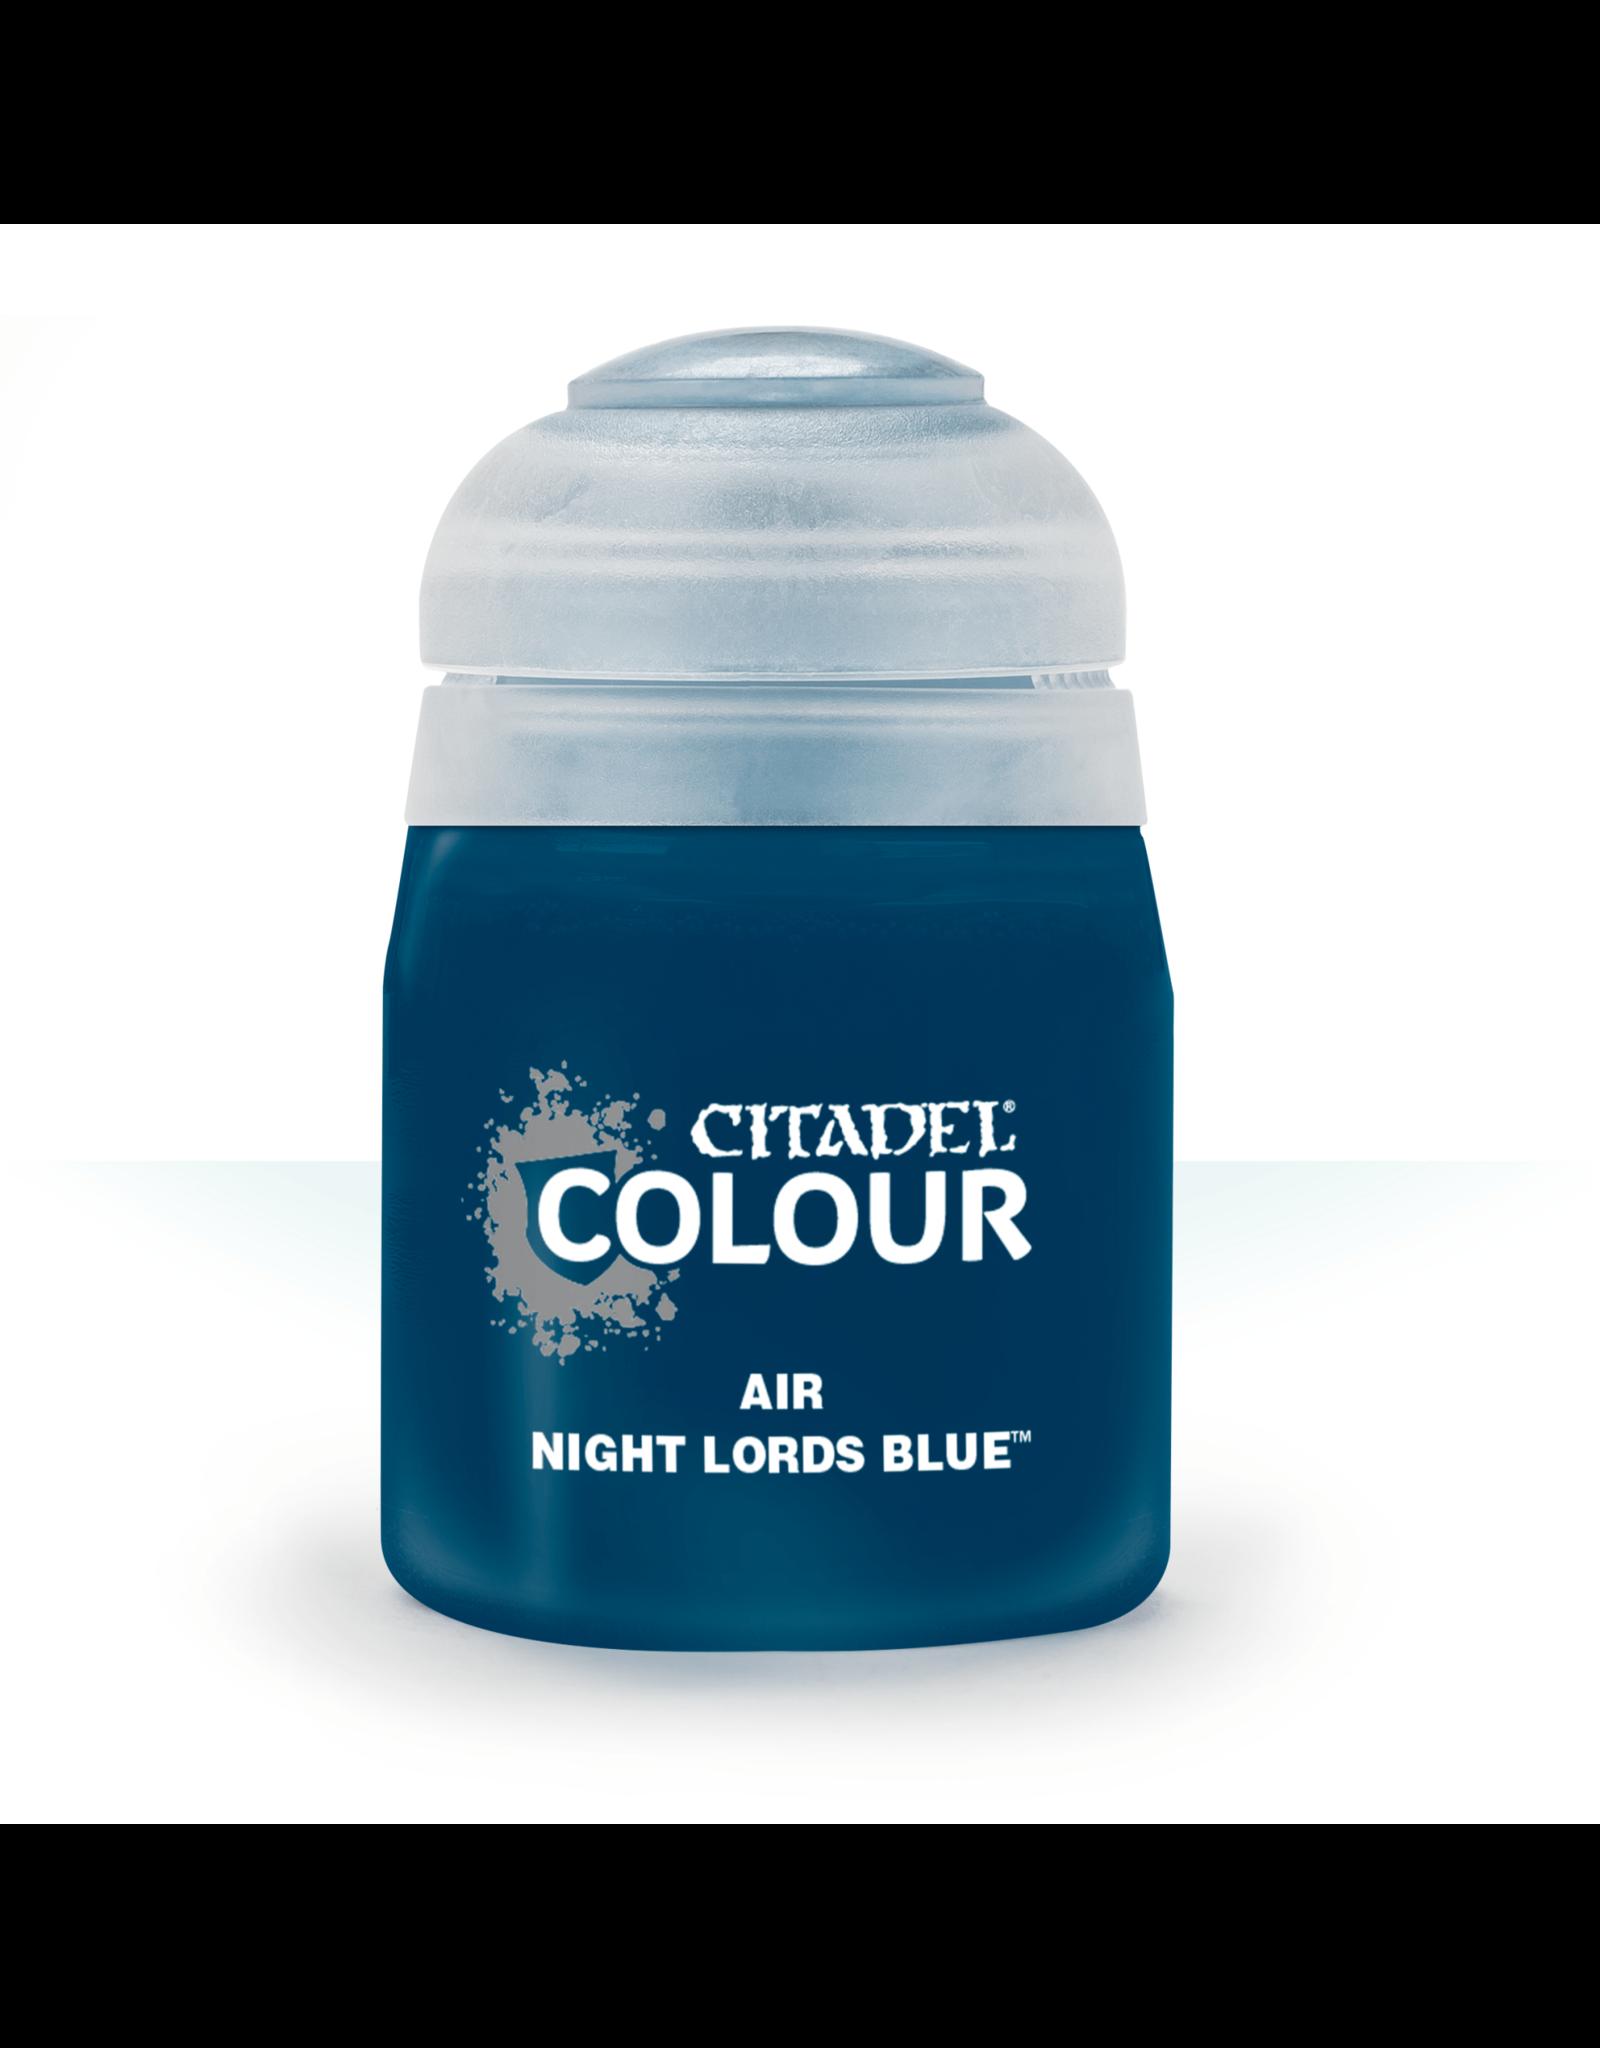 Citadel Citadel Paints Air Paint Night Lords Blue